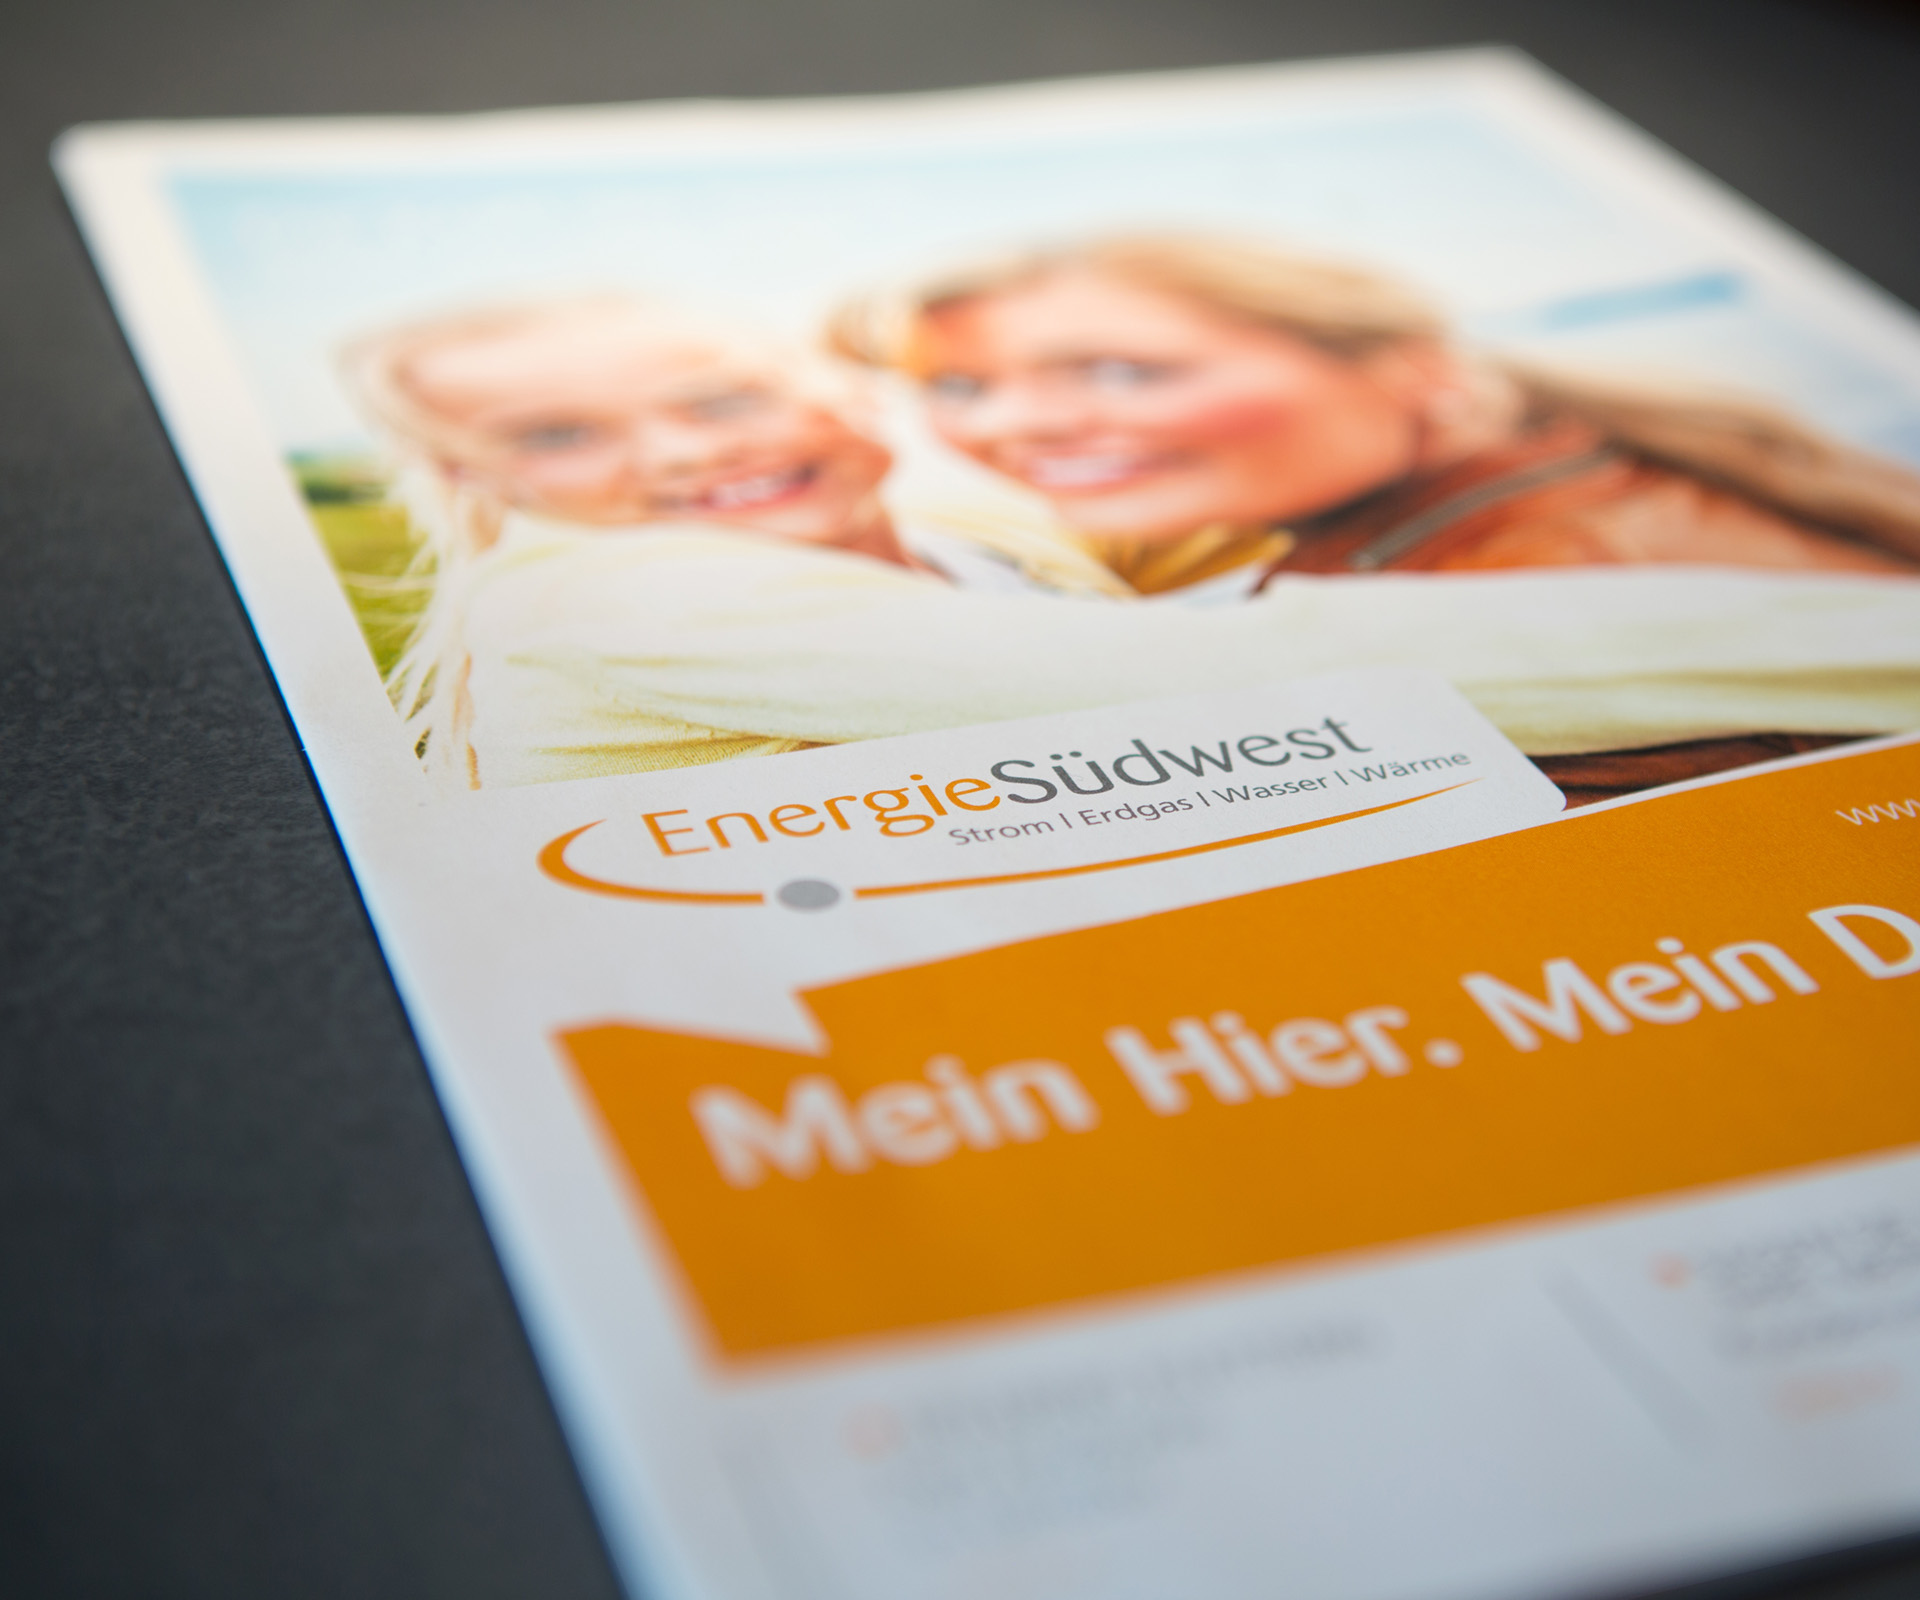 Sabath Media Werbeagentur - EnergieSüdwest - Referenzbild 3